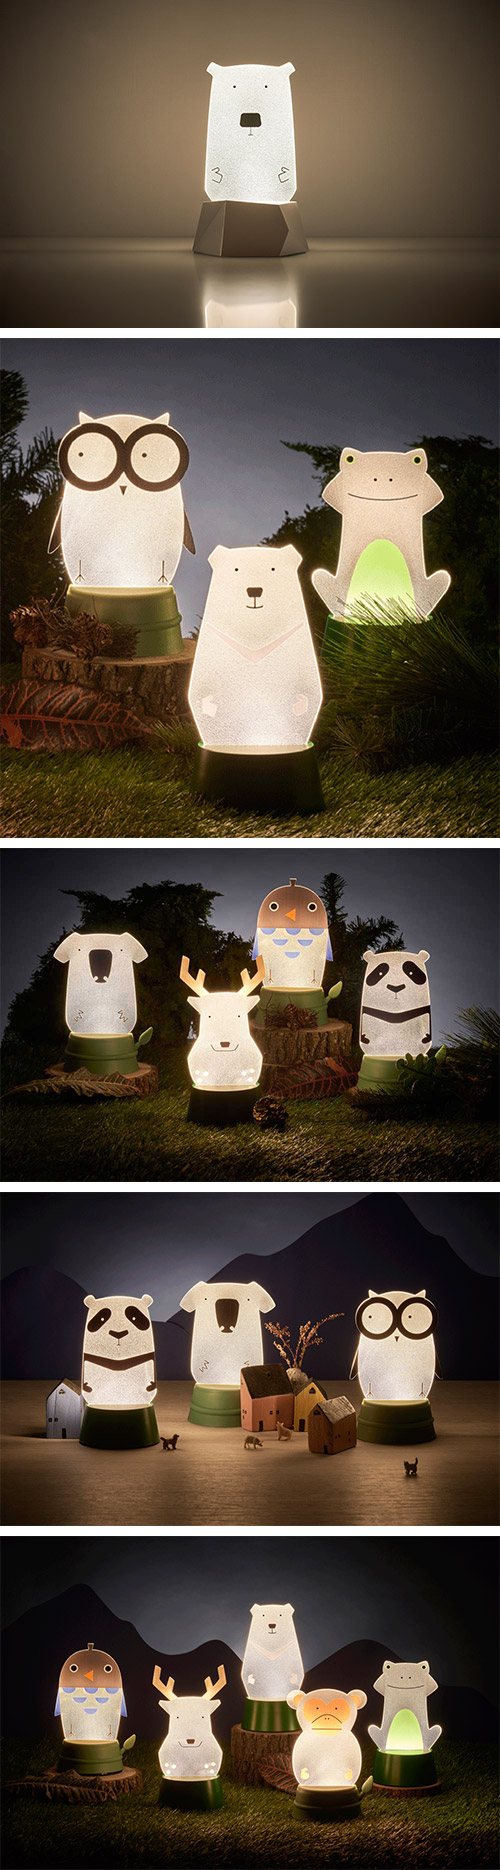 Xcellent LED 可愛夜燈時光派對 北極熊